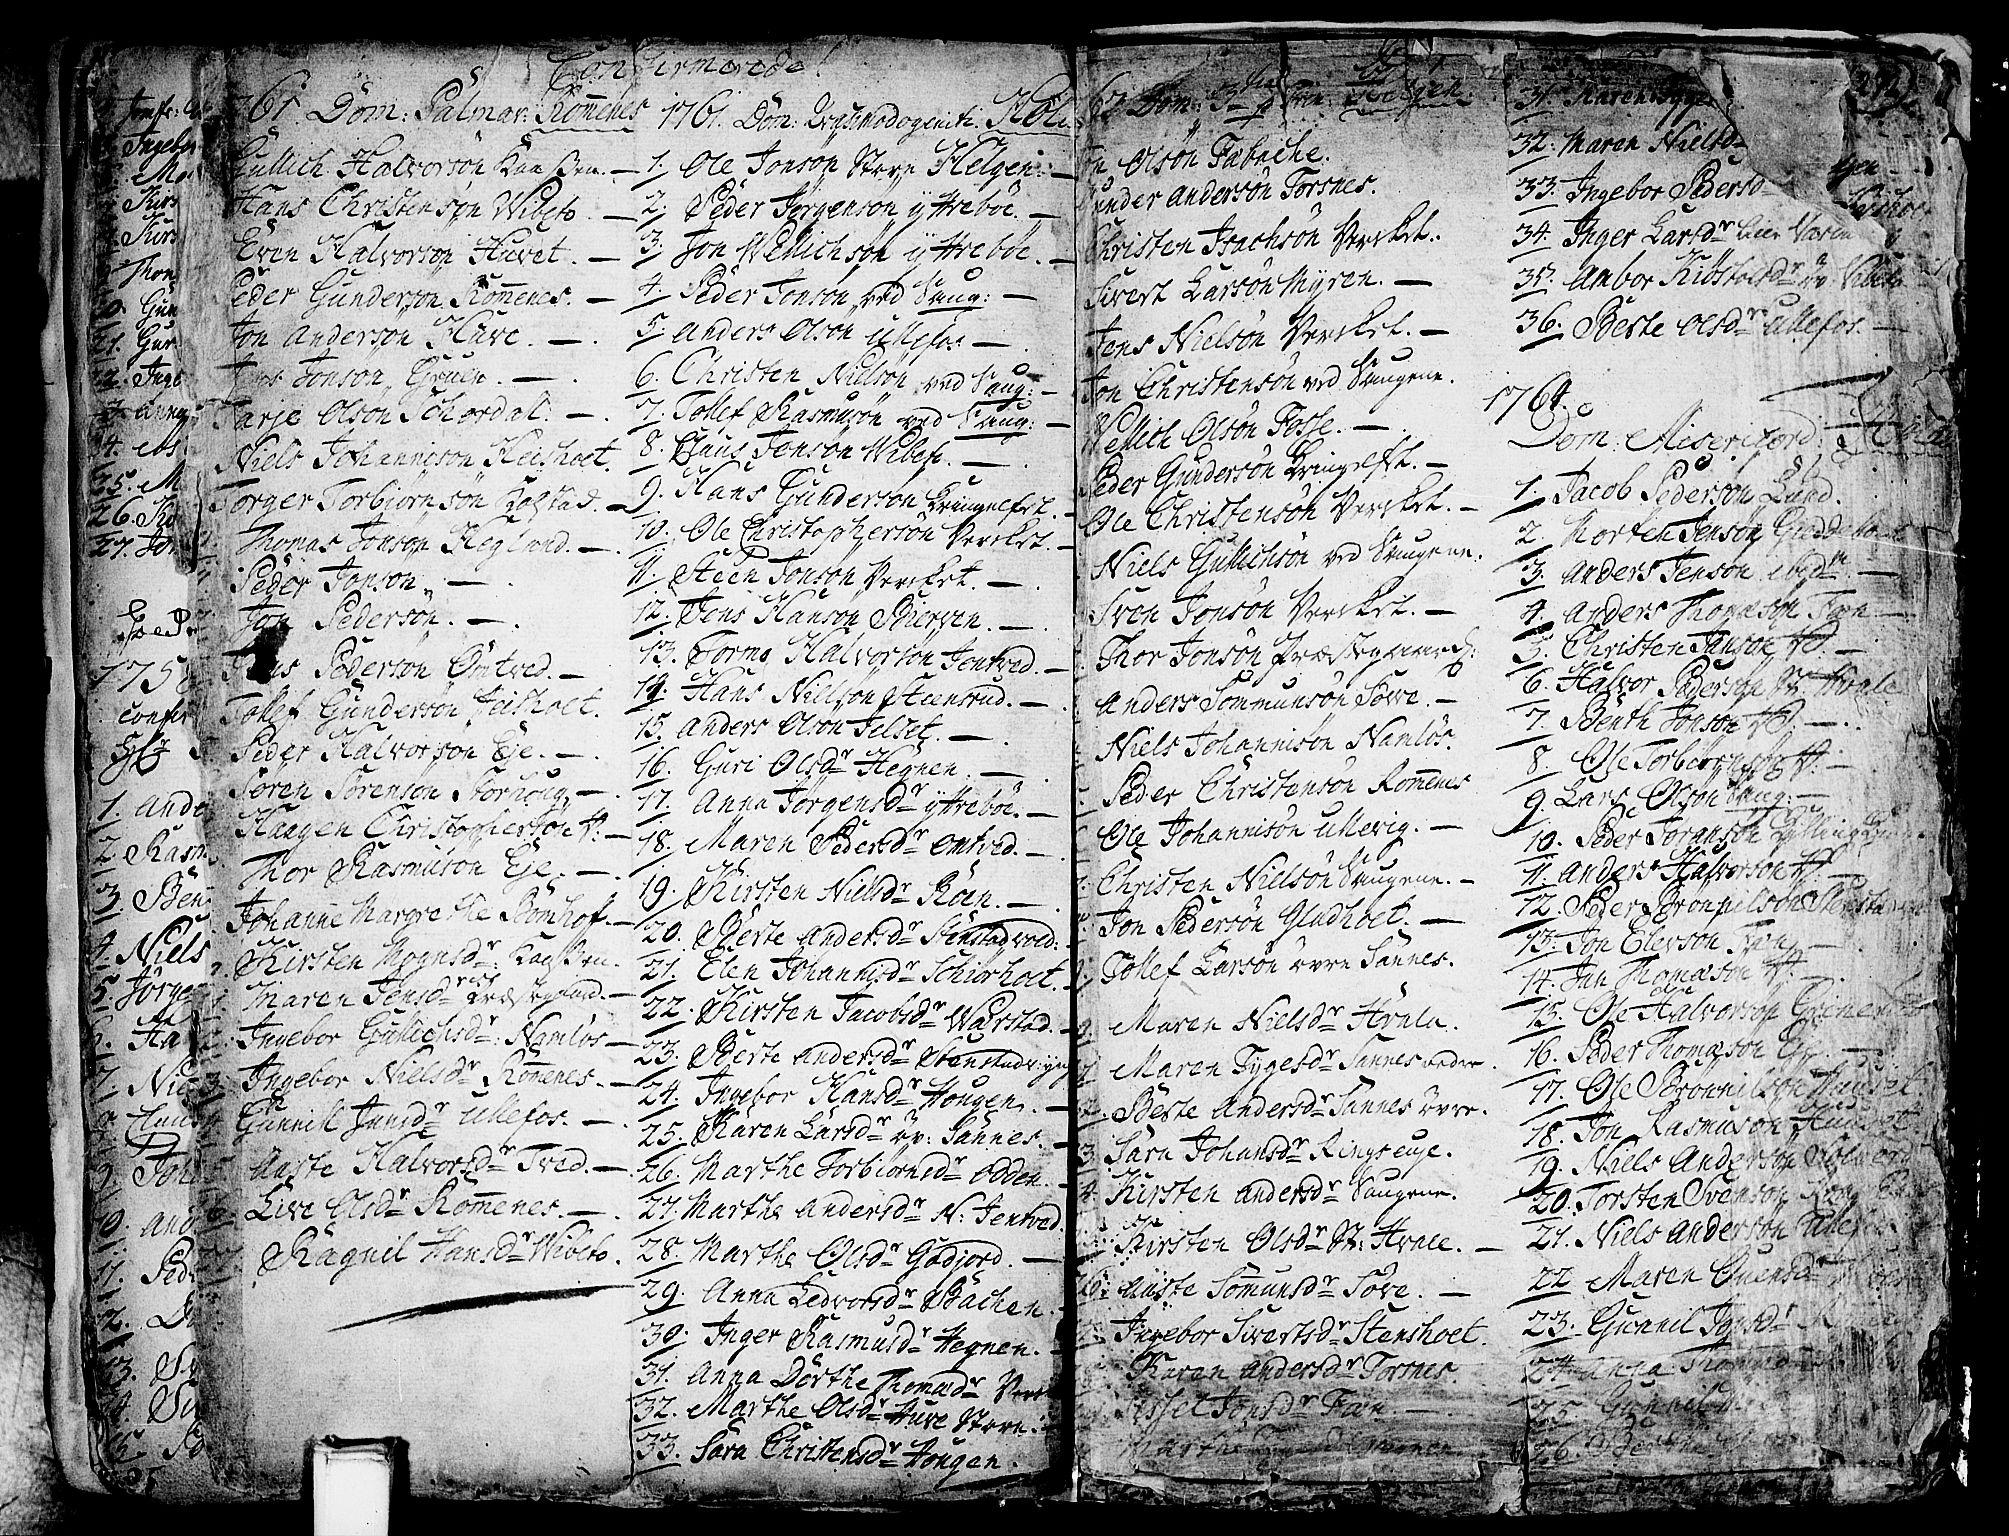 SAKO, Holla kirkebøker, F/Fa/L0001: Ministerialbok nr. 1, 1717-1779, s. 271